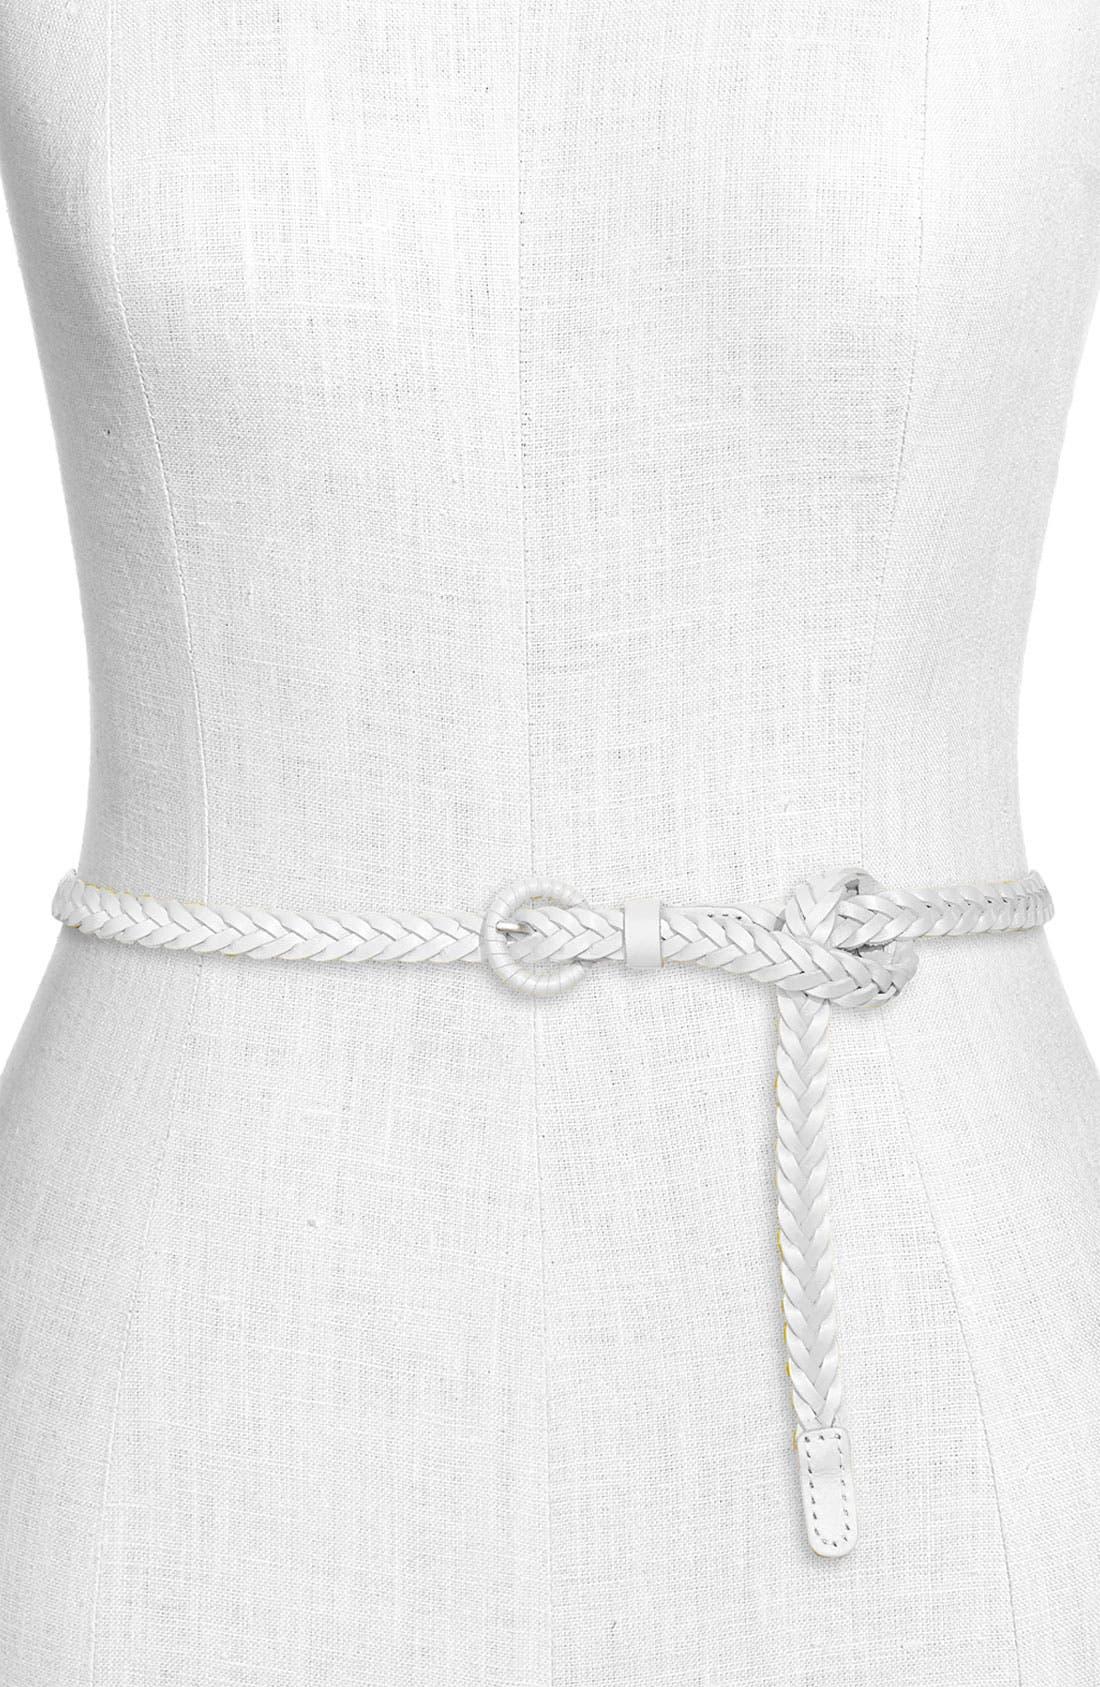 Alternate Image 1 Selected - Tarnish Skinny Braided Leather Belt